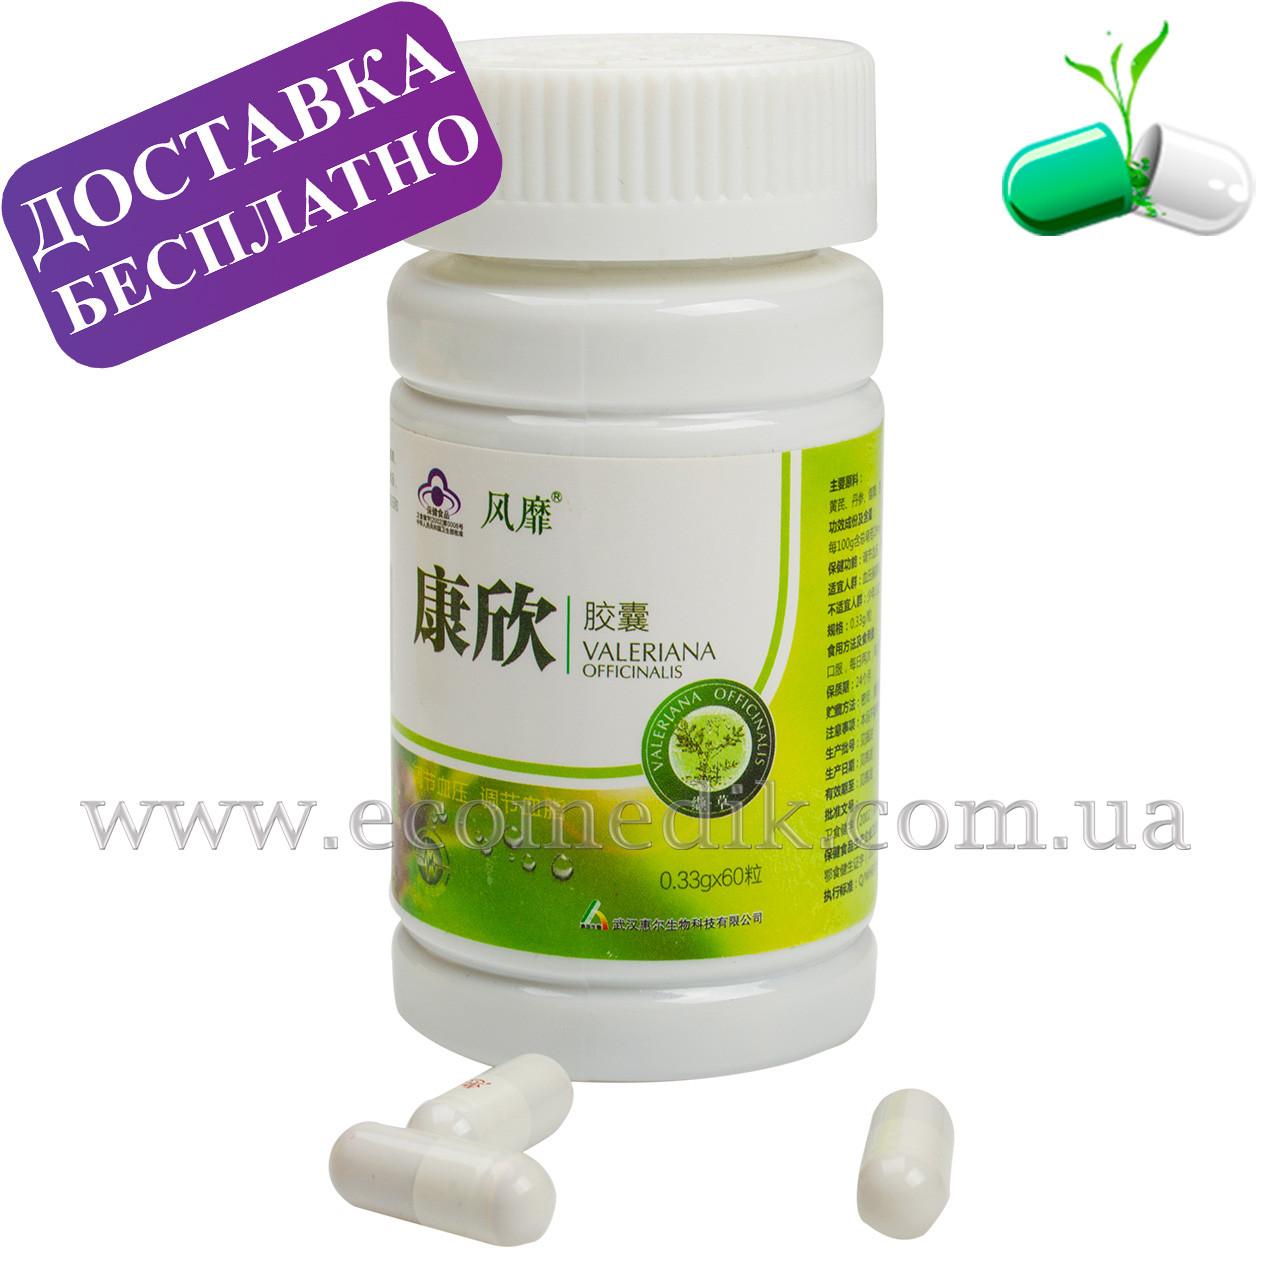 препарат для снижения холестерина торвакард отзывы